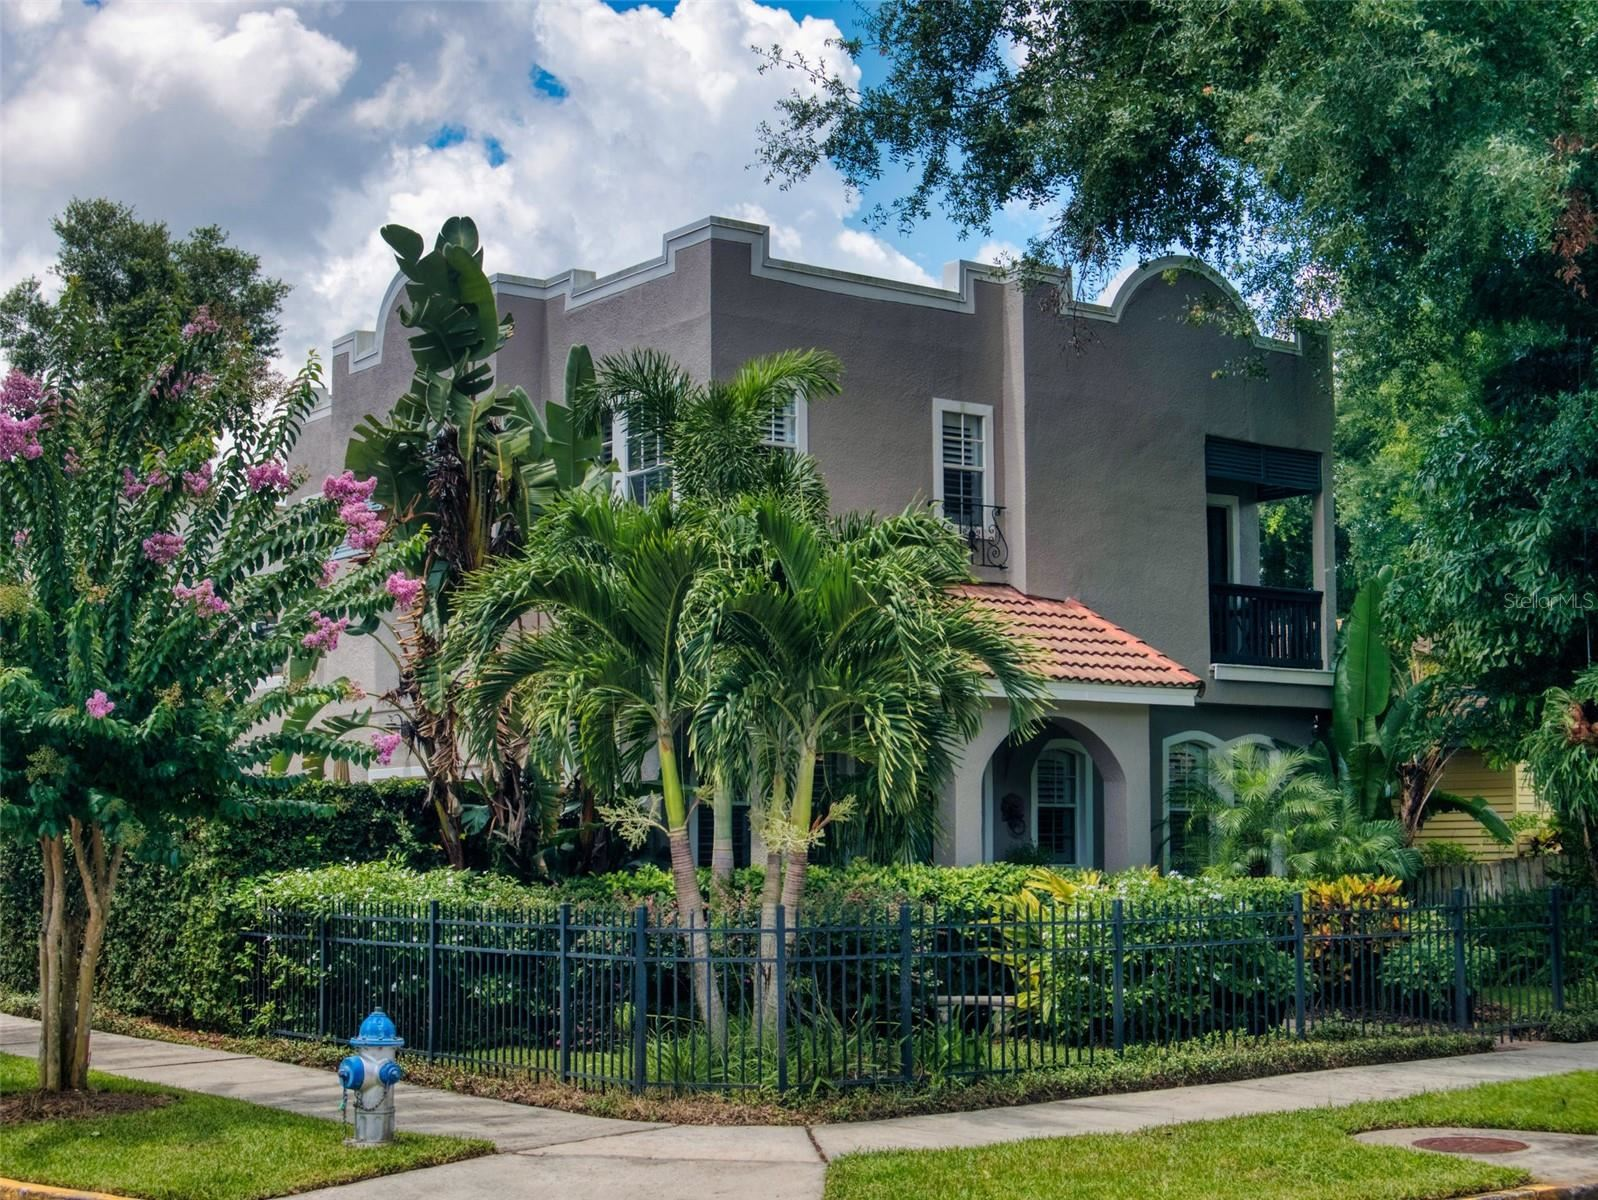 802 EMERALD LANE, Orlando, FL 32801 - #: O5958822